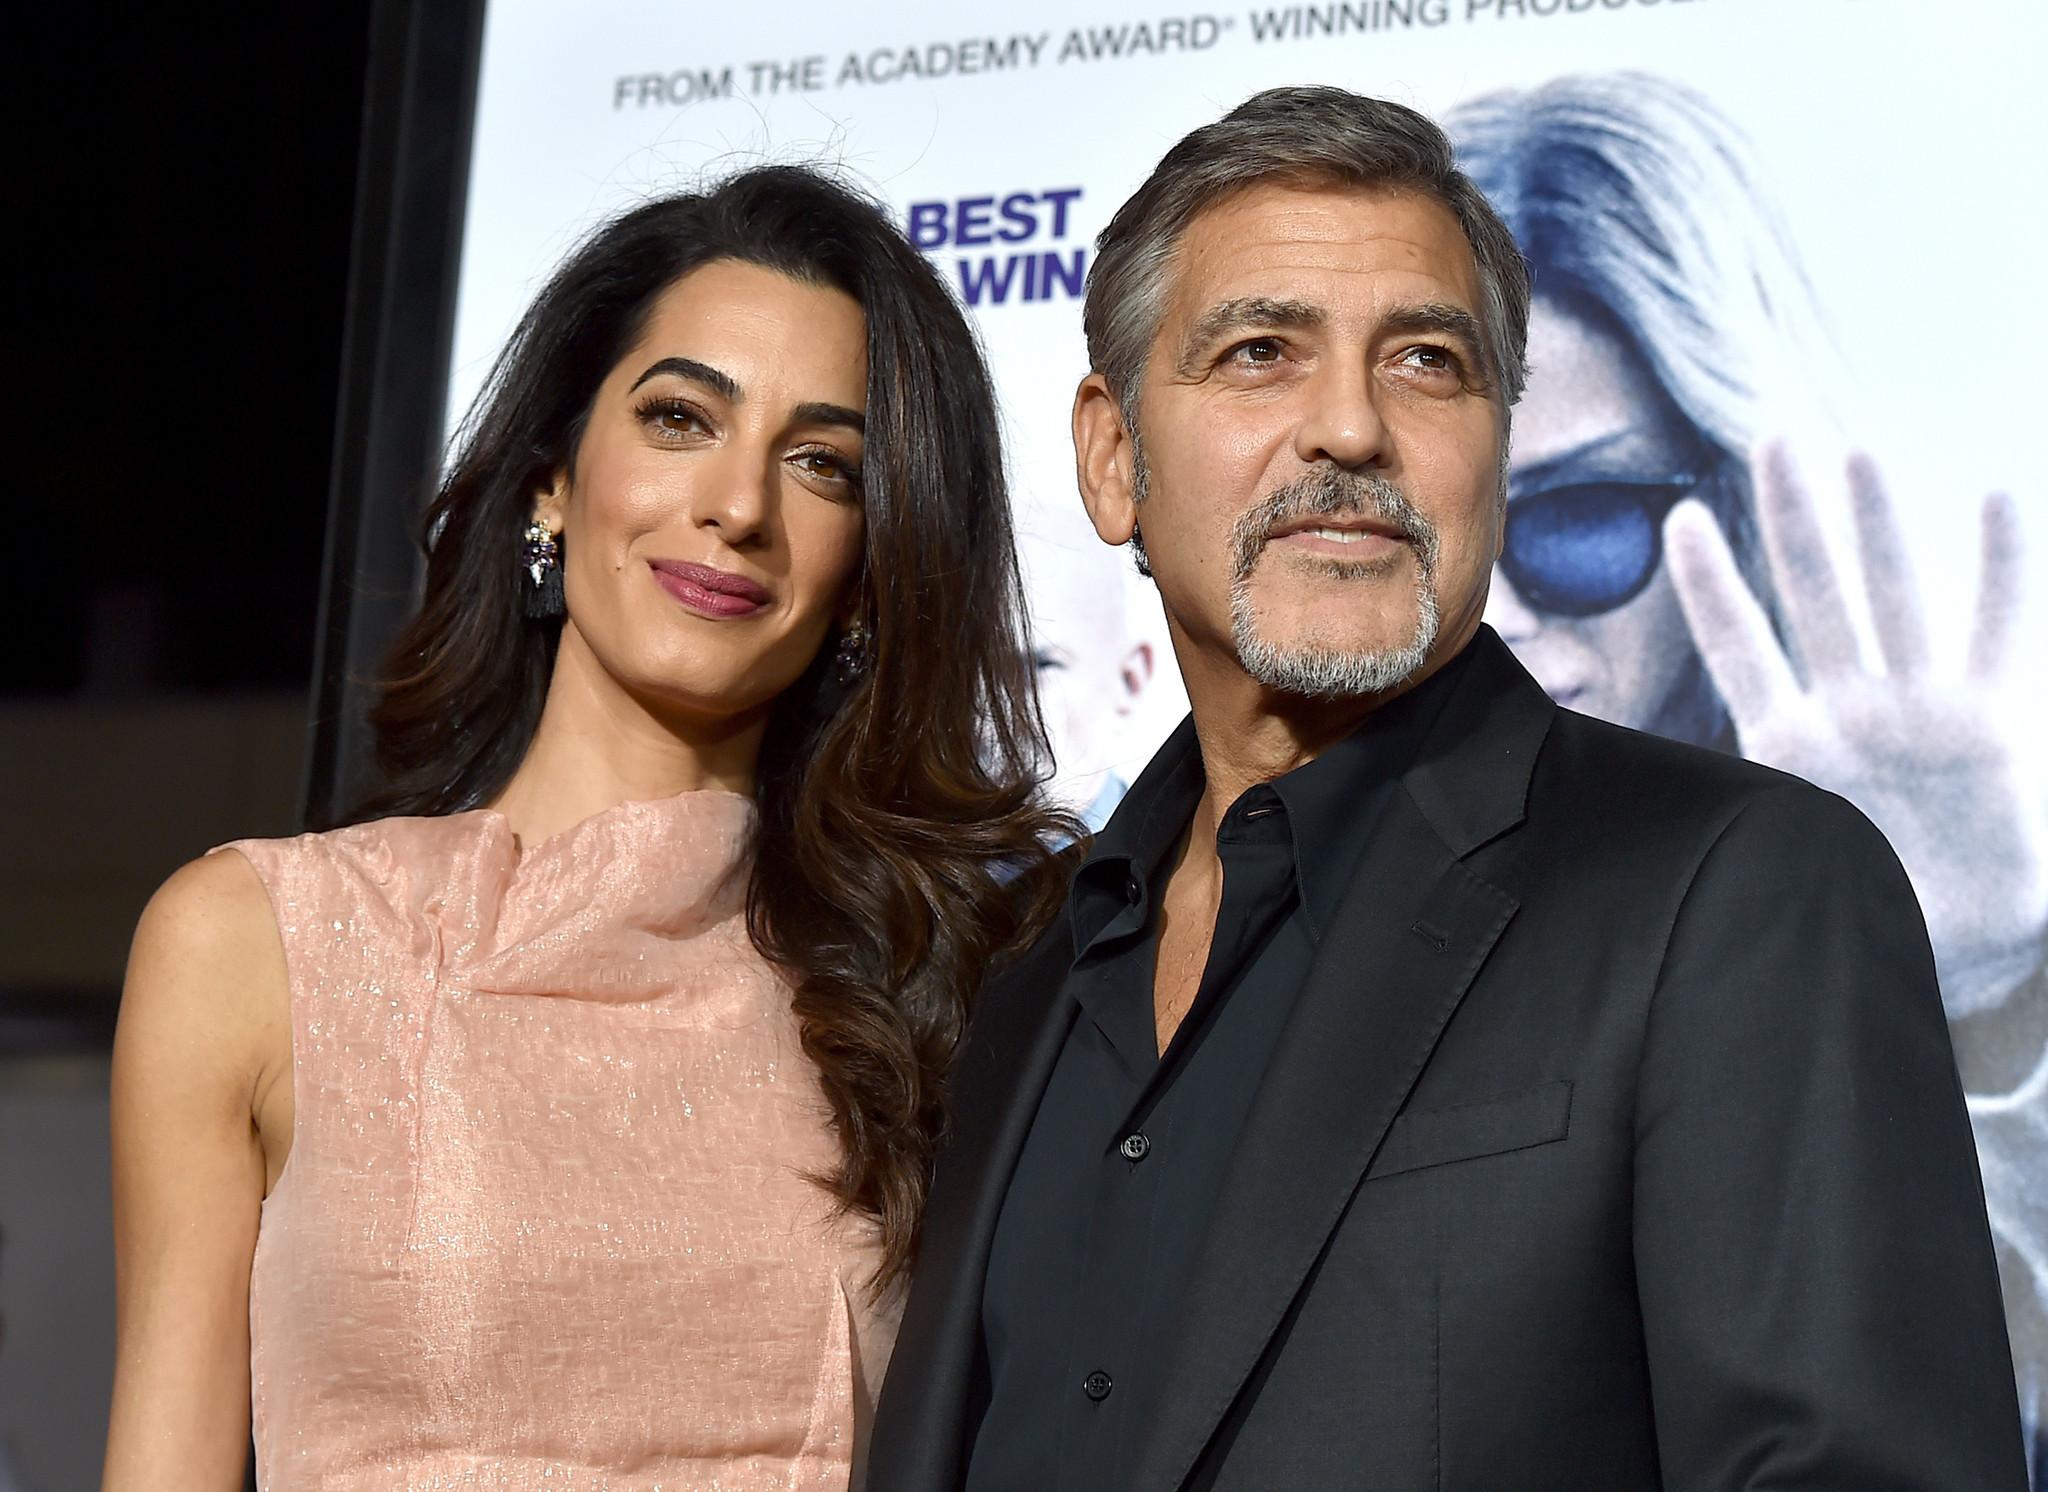 George Clooney, wife Amal adopt shelter dog named Millie